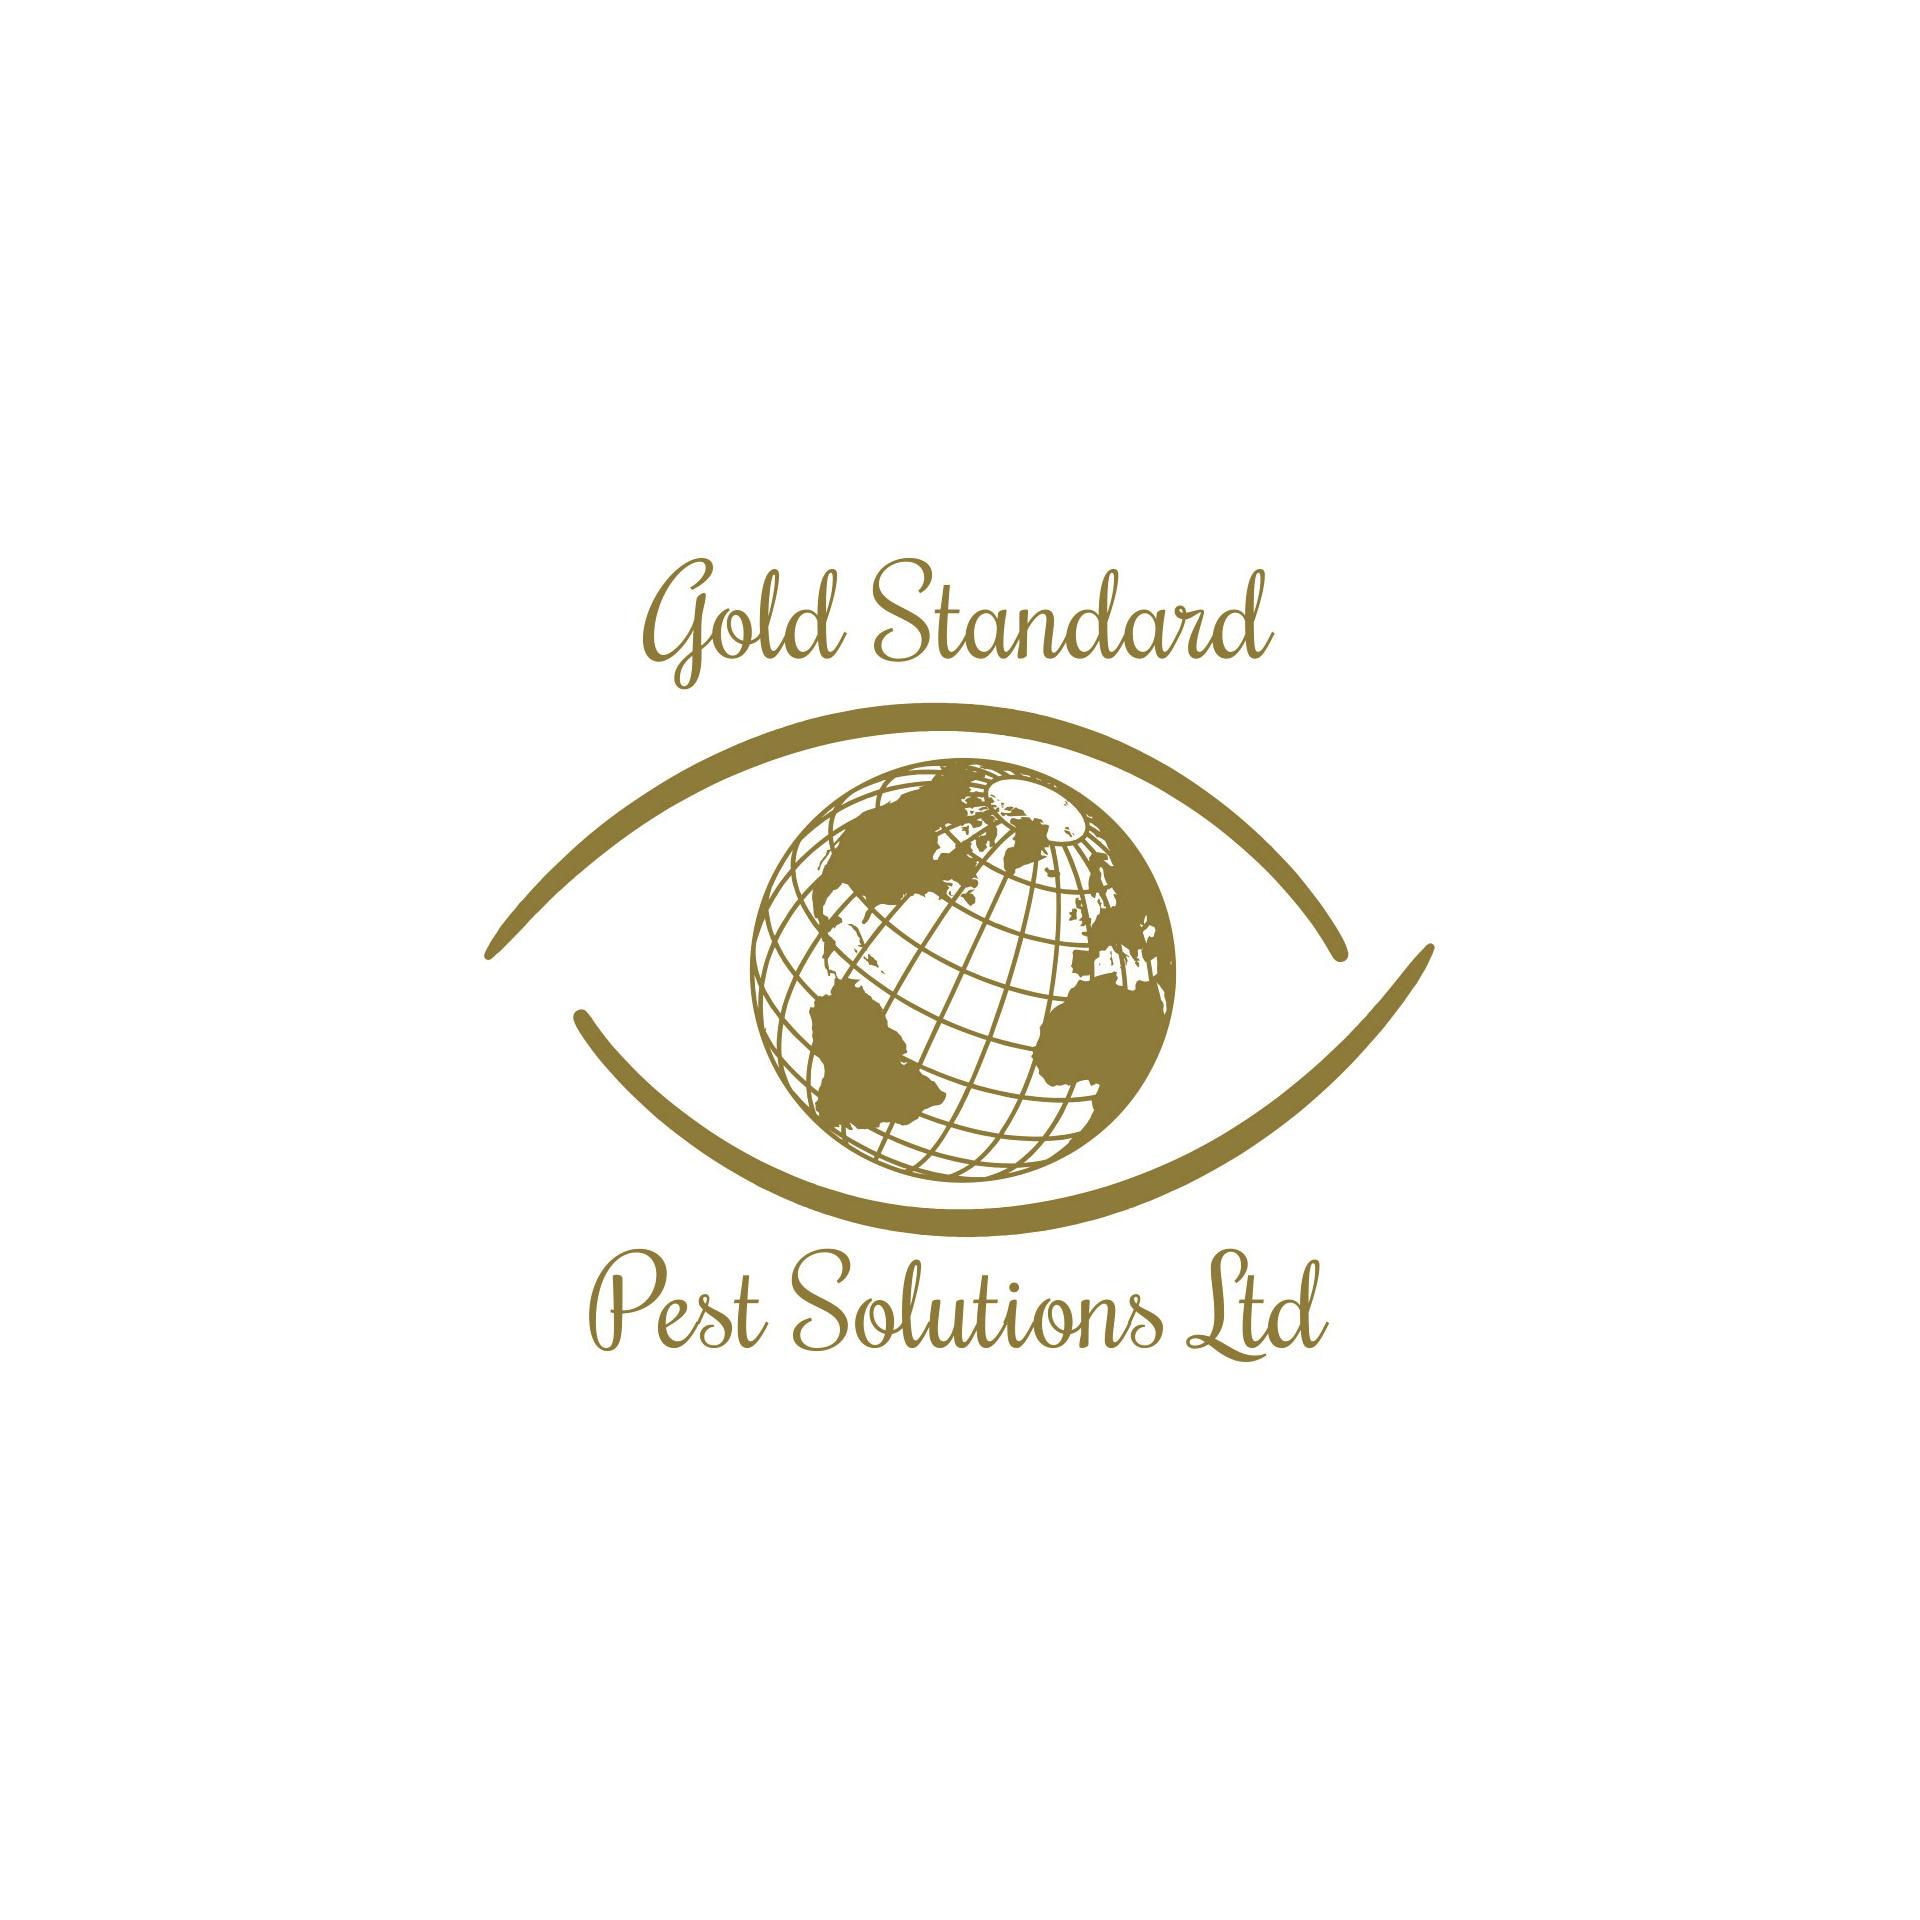 GOLD STANDARD PEST SOLUTIONS LTD